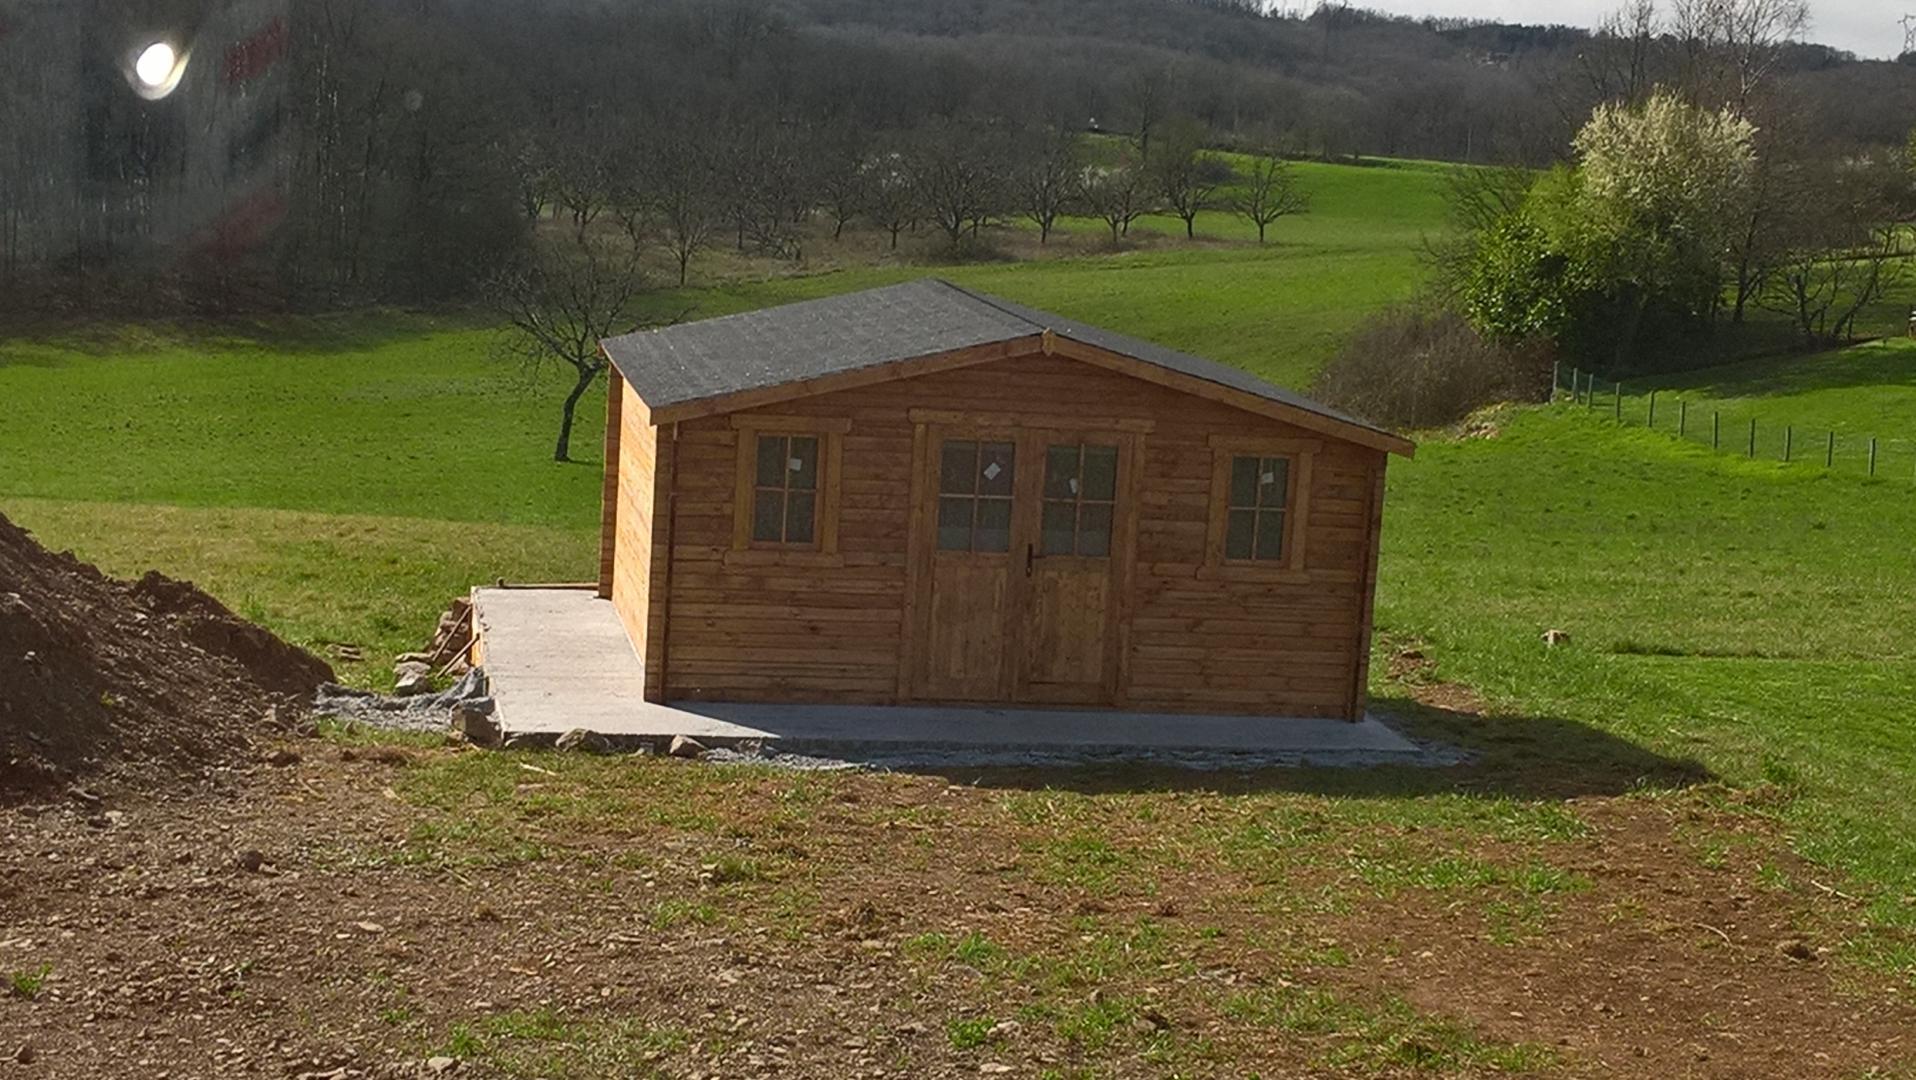 Sélection Premium 44E54 F4Eb3 Abri De Jardin Habitable 20M2 ... intérieur Abri De Jardin Habitable